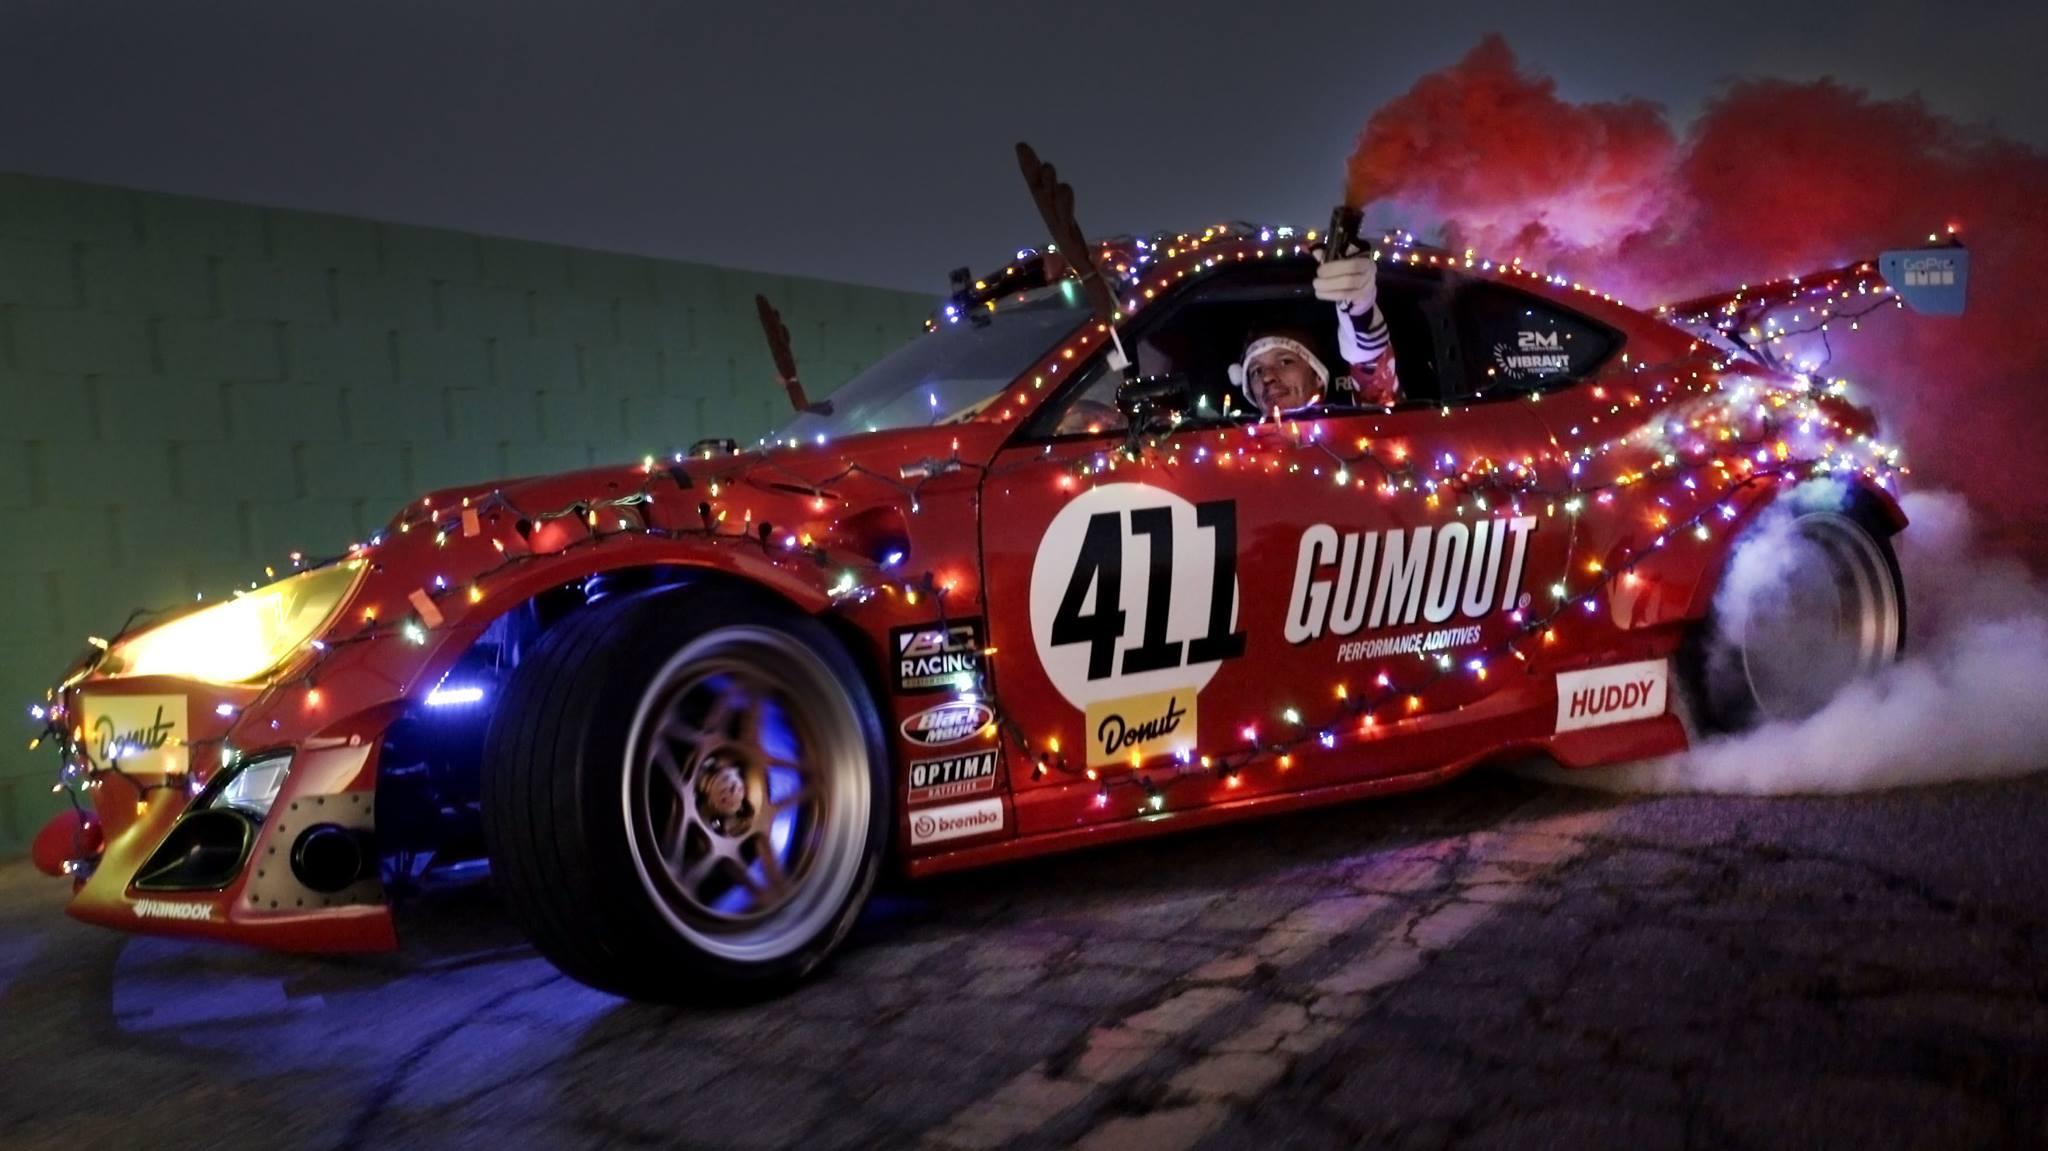 Ryan tuerck delivers christmas gifts in ferrari powered for Ferrari christmas